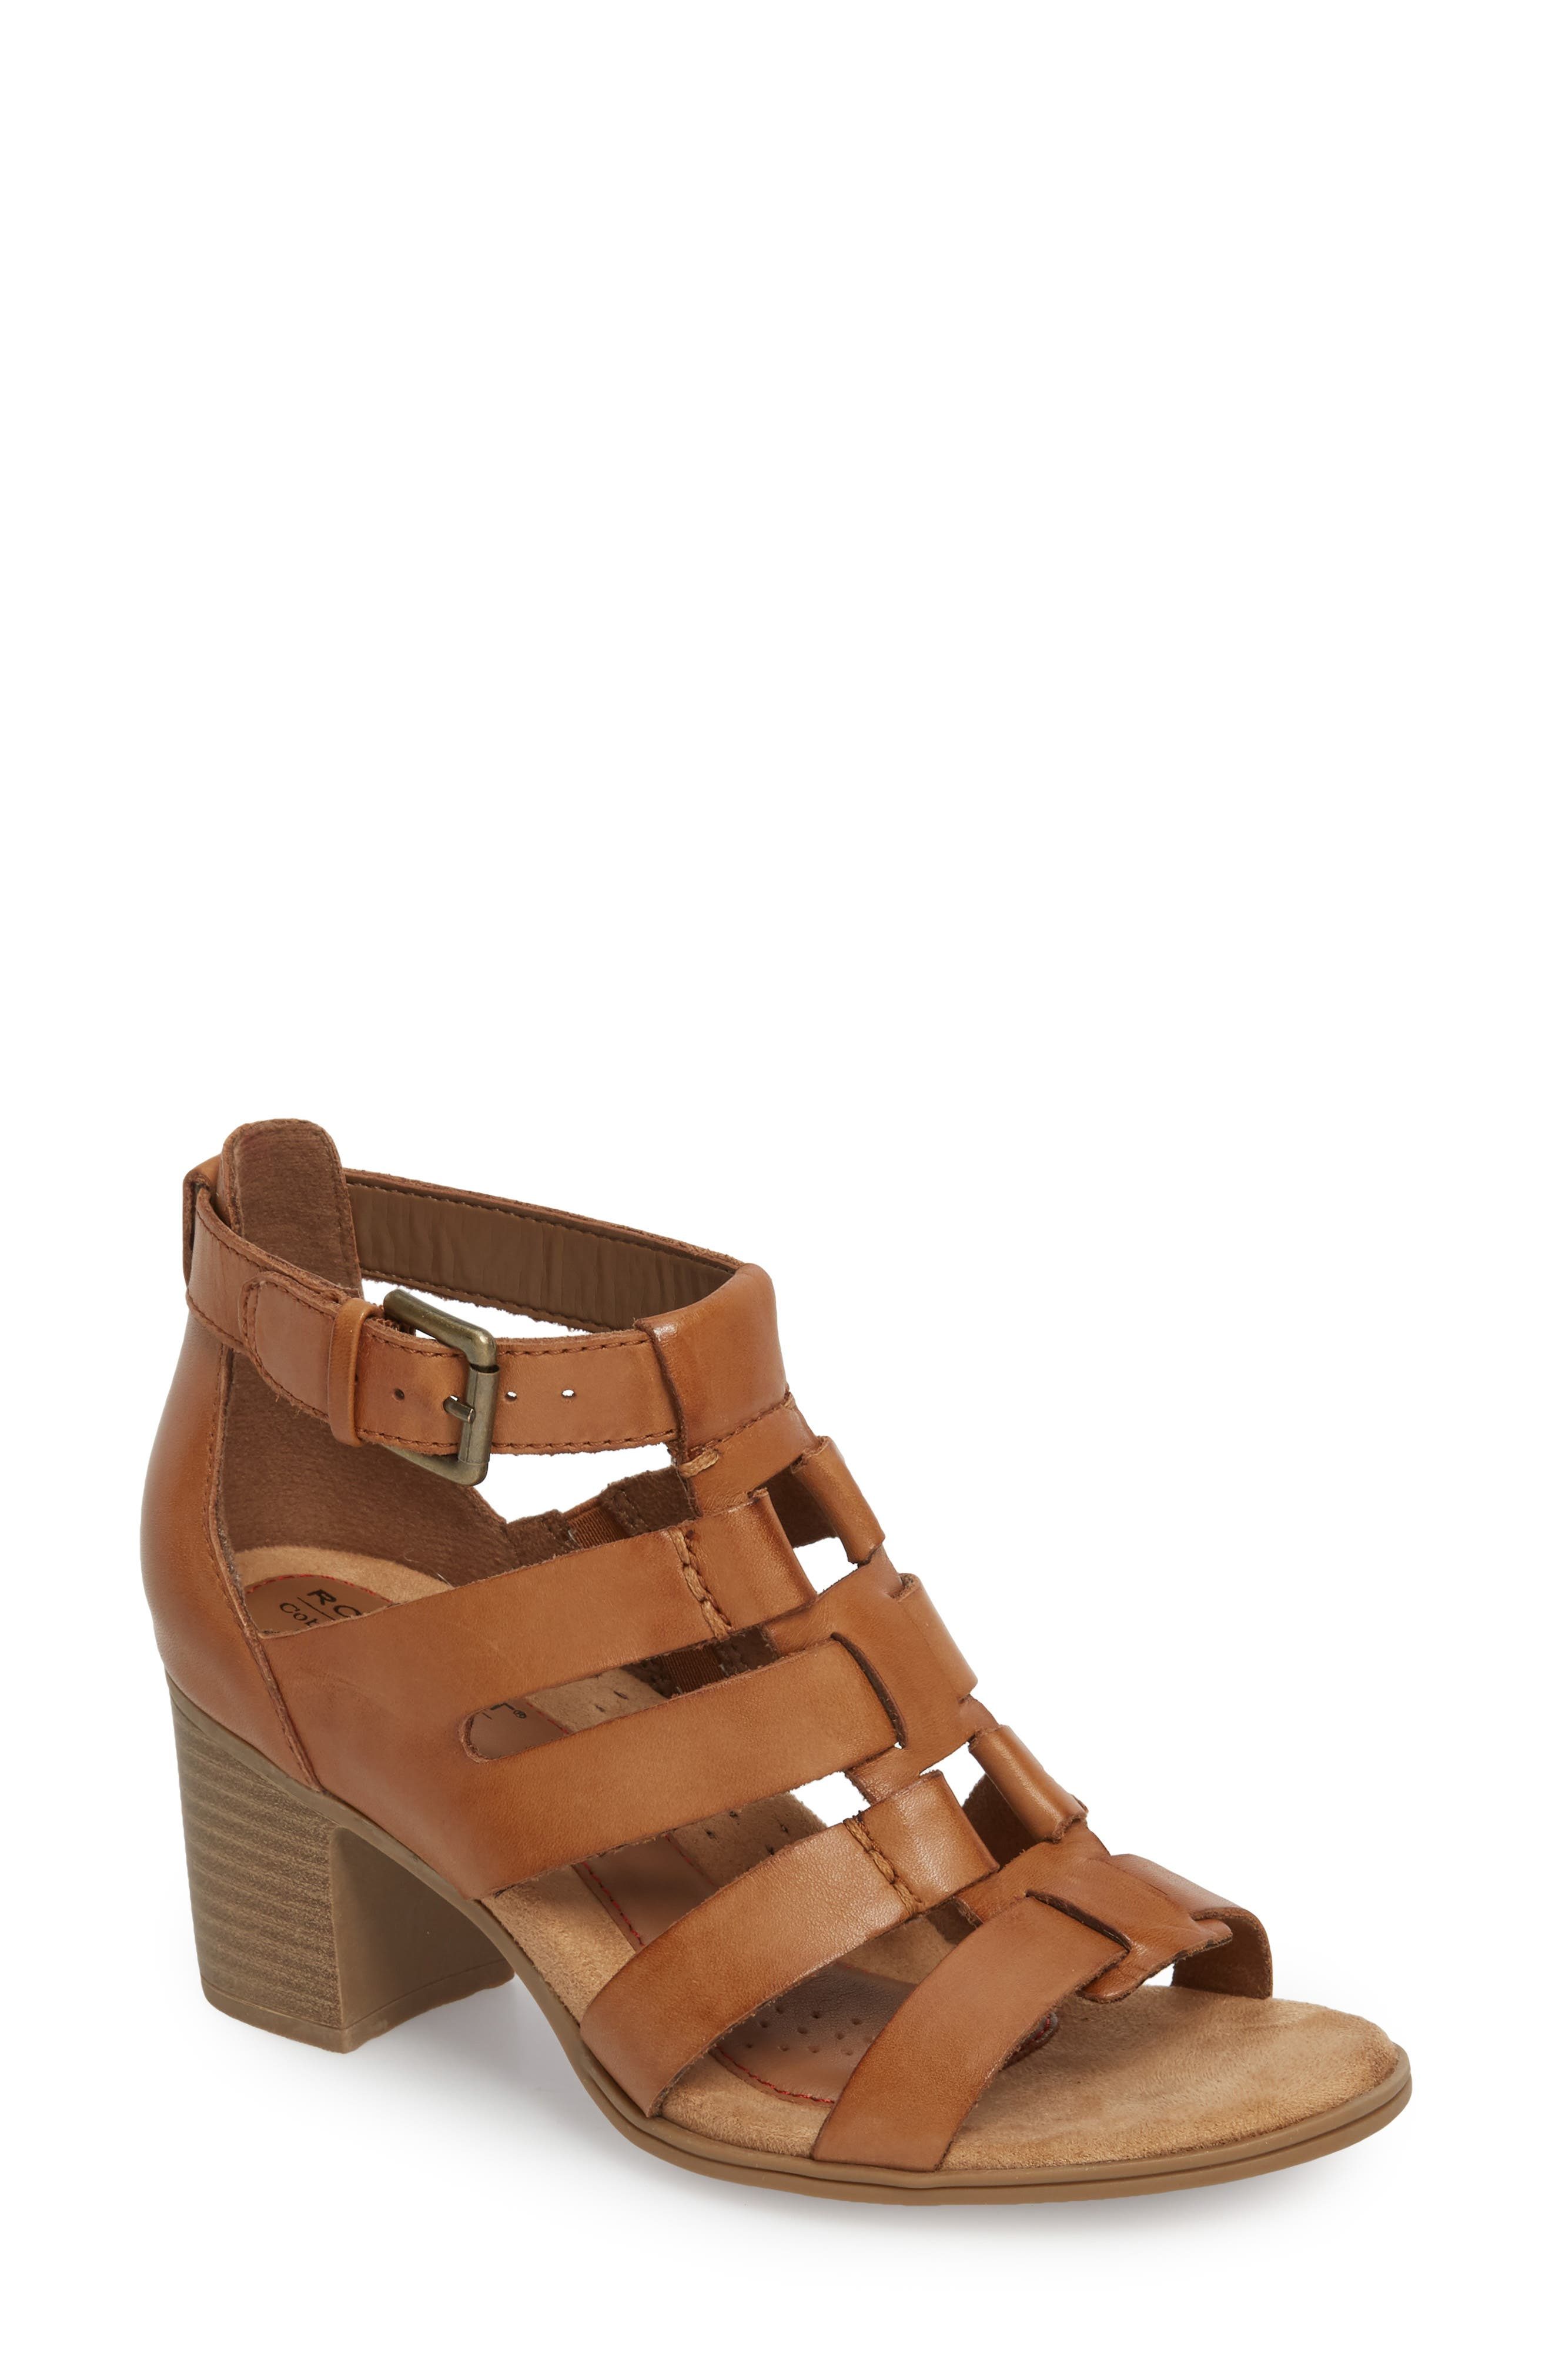 Hattie Block Heel Gladiator Sandal,                             Main thumbnail 1, color,                             231